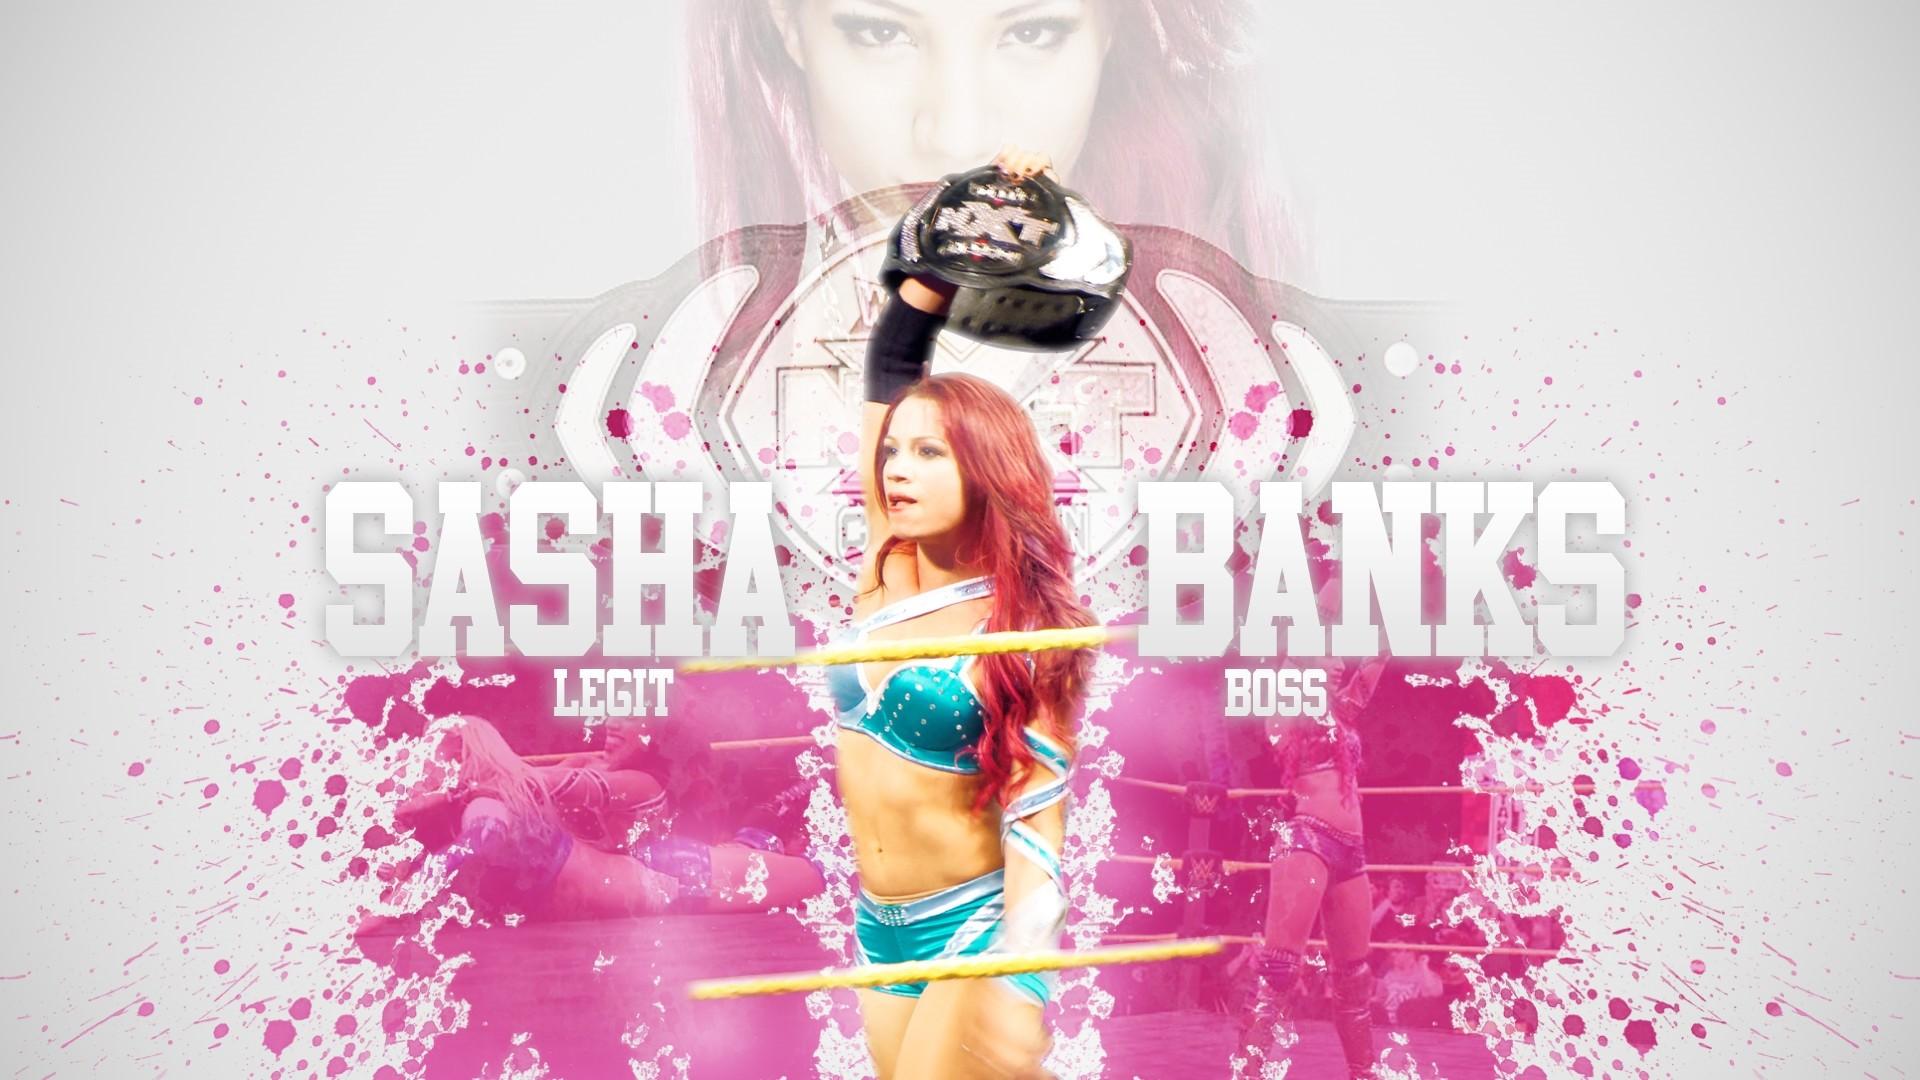 Sasha Banks Background Wallpaper